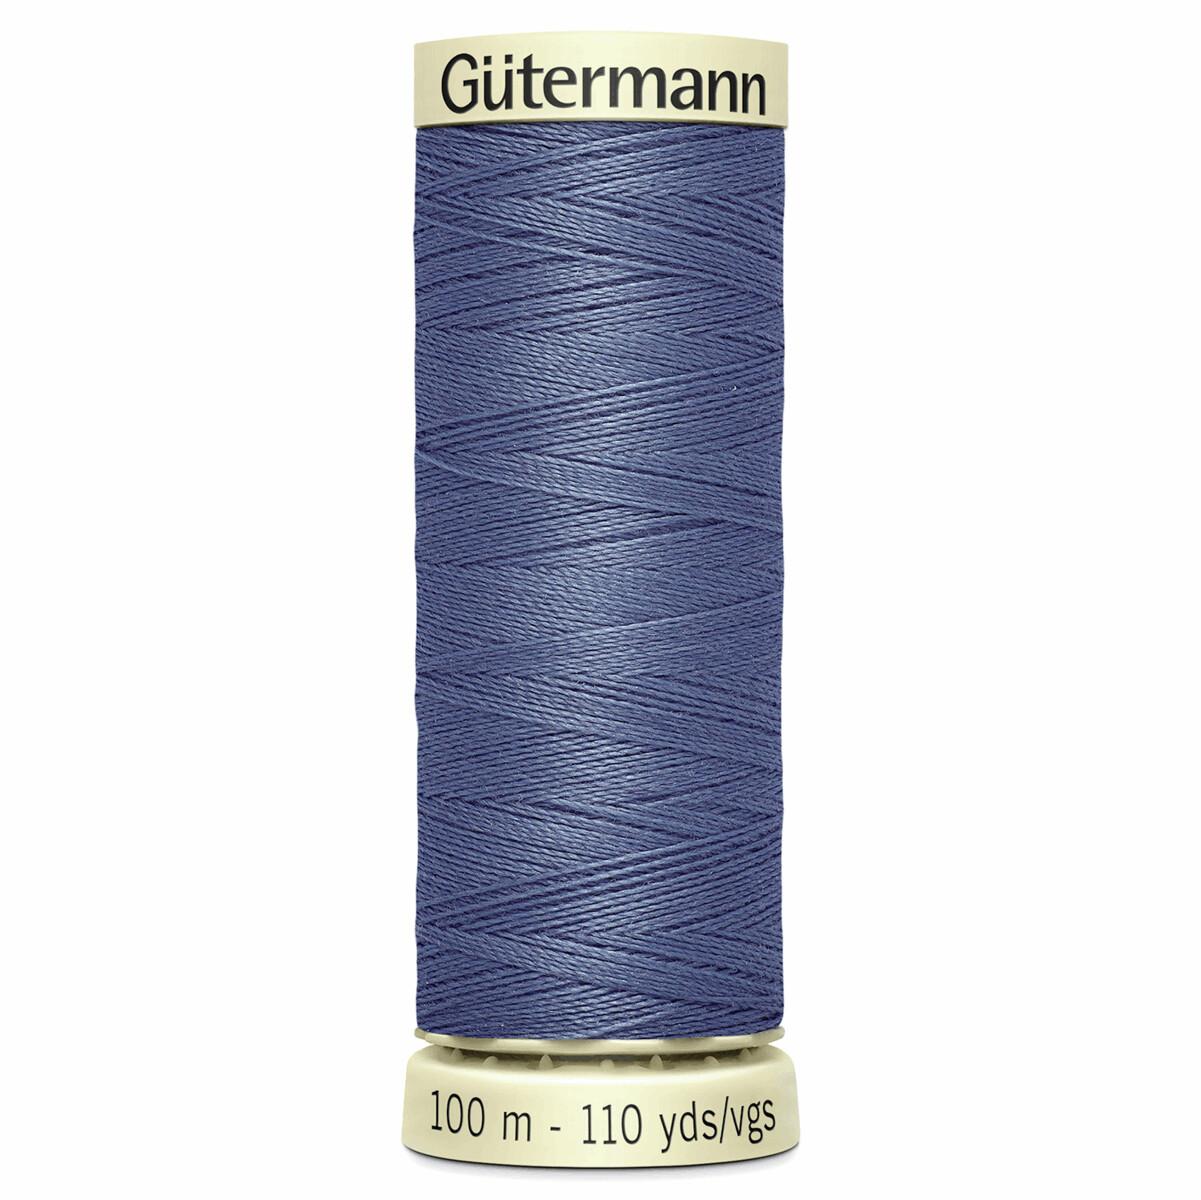 Gutermann Sew-All thread 521